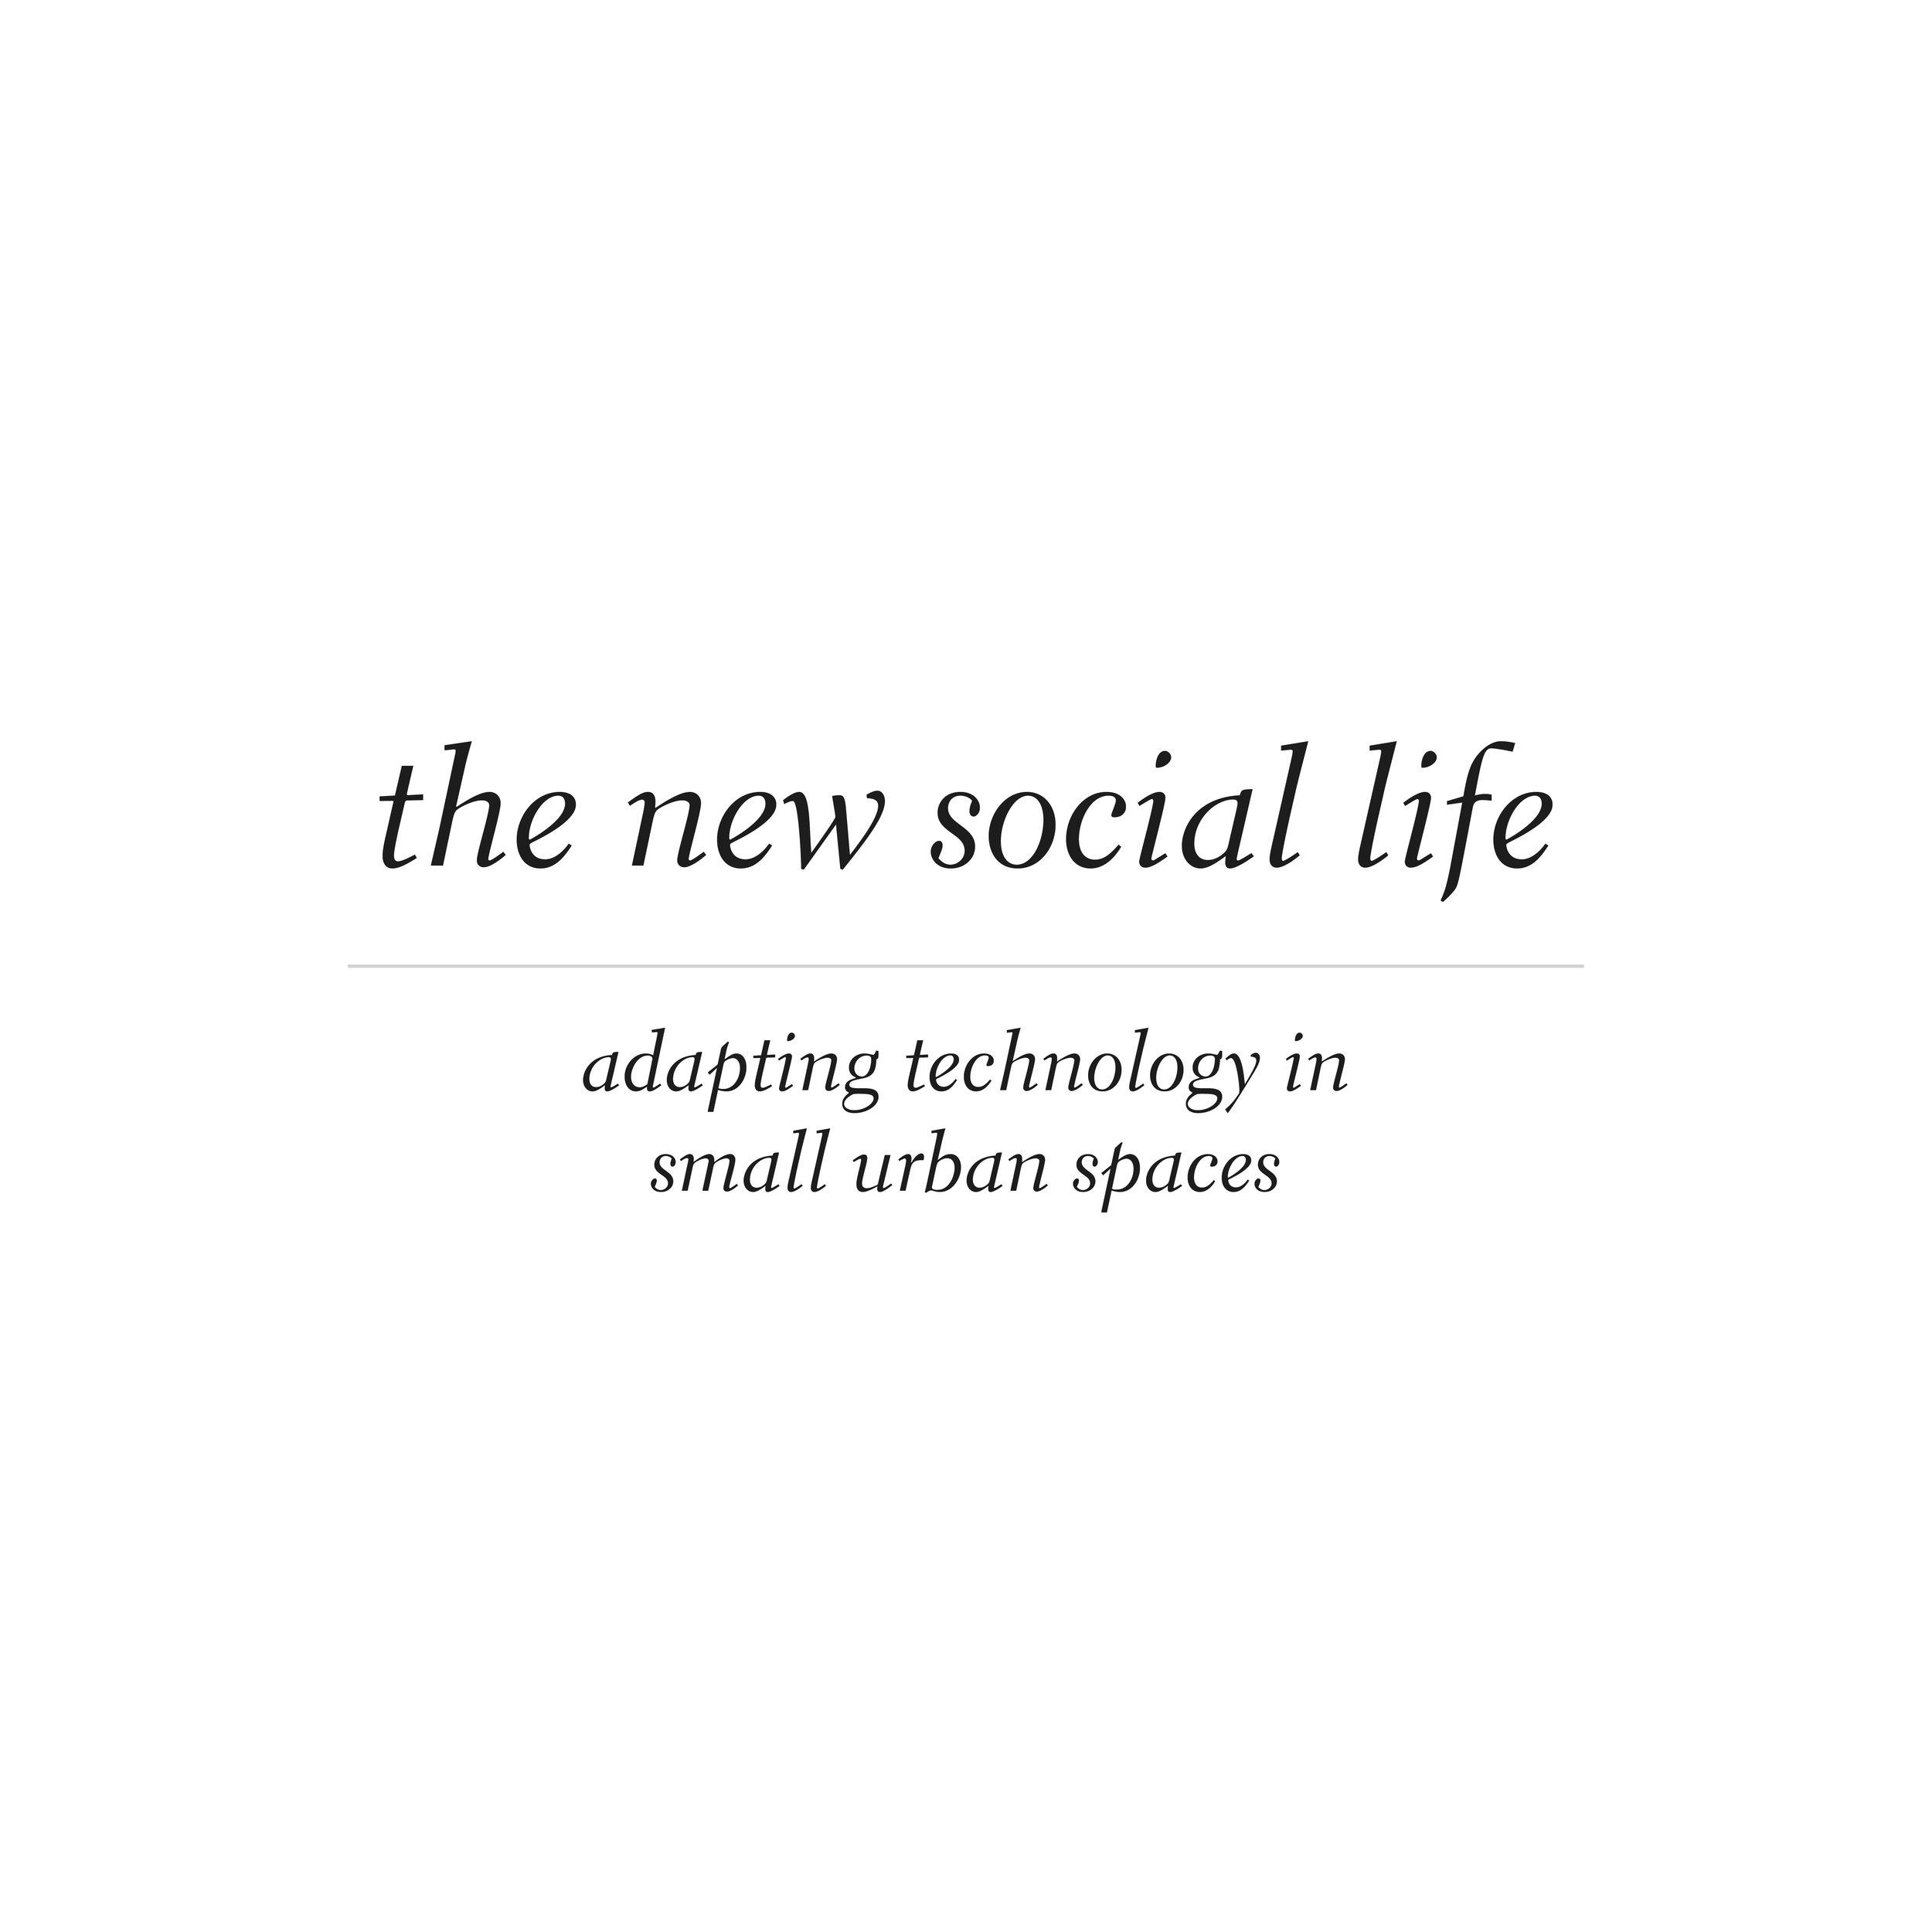 the new social life 2-01.jpg